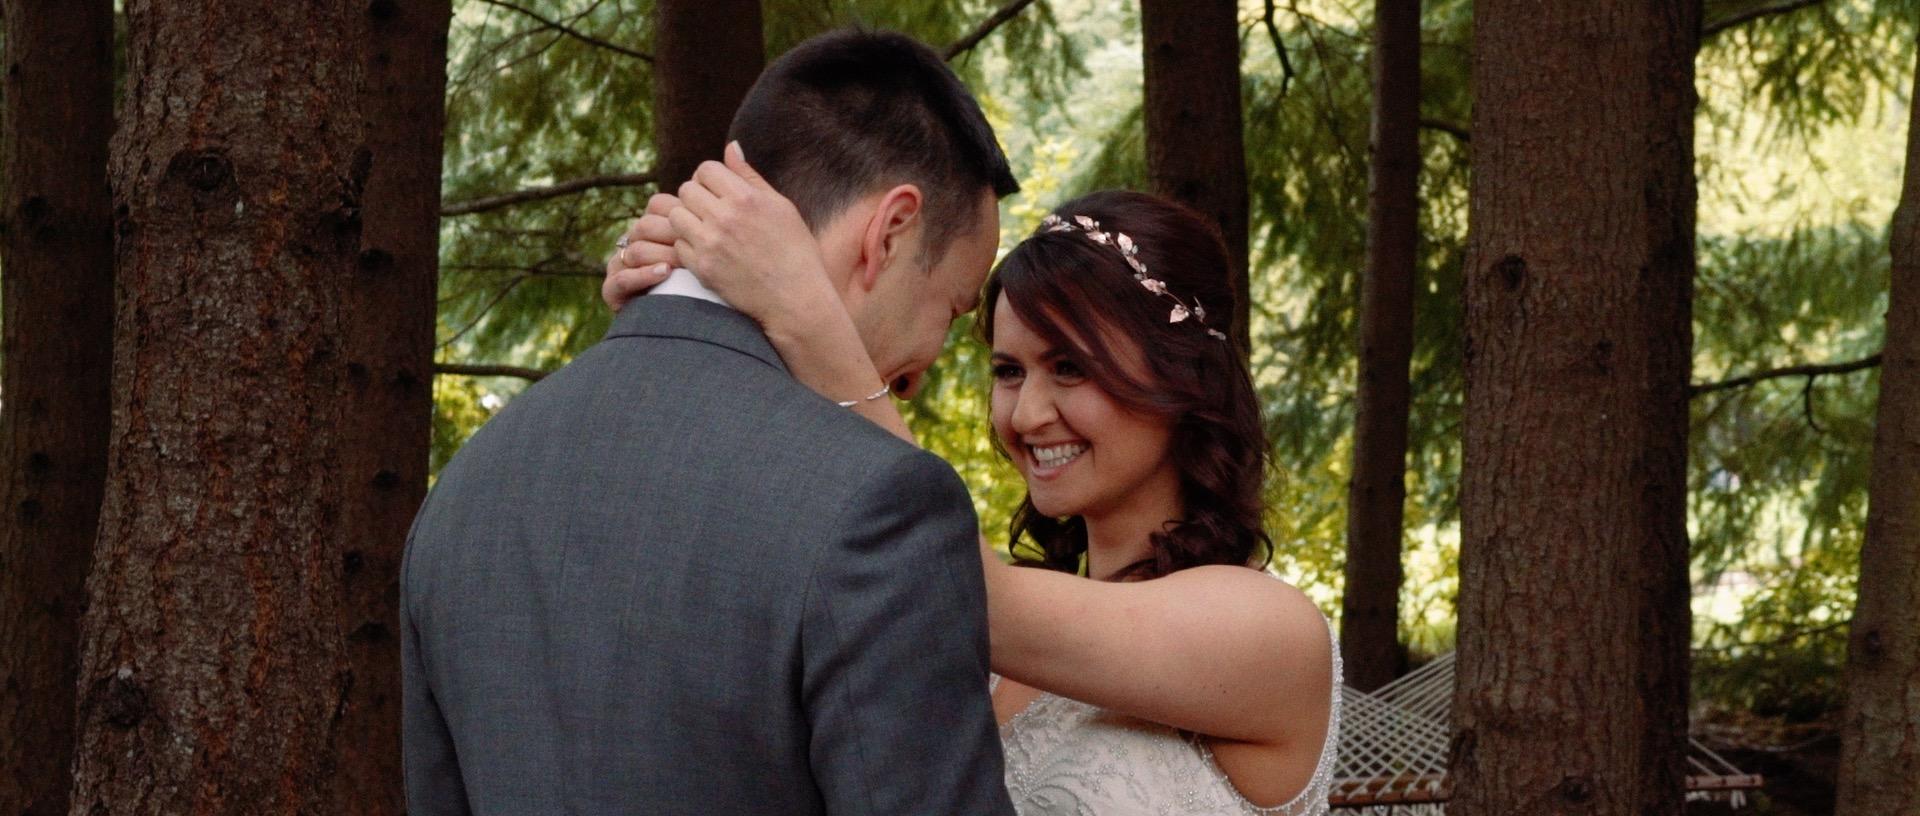 Gorge Crest Wedding Videographer